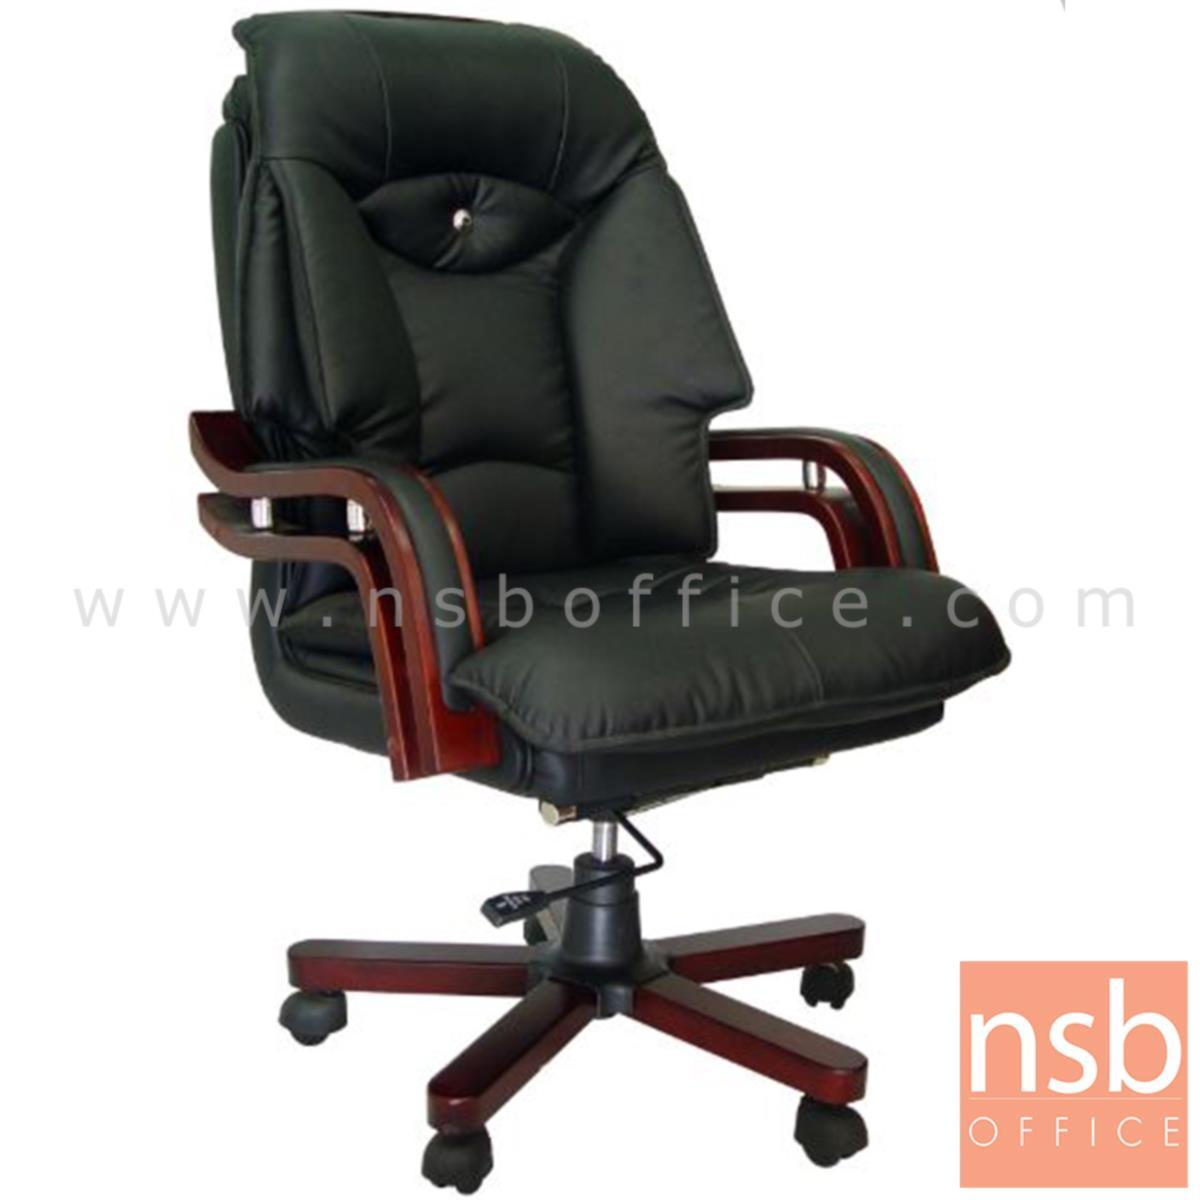 B25A056:เก้าอี้ผู้บริหารหนัง PU รุ่น Hernandez (เฮอร์แนนเดซ)  โช๊คแก๊ส มีก้อนโยก ขาไม้